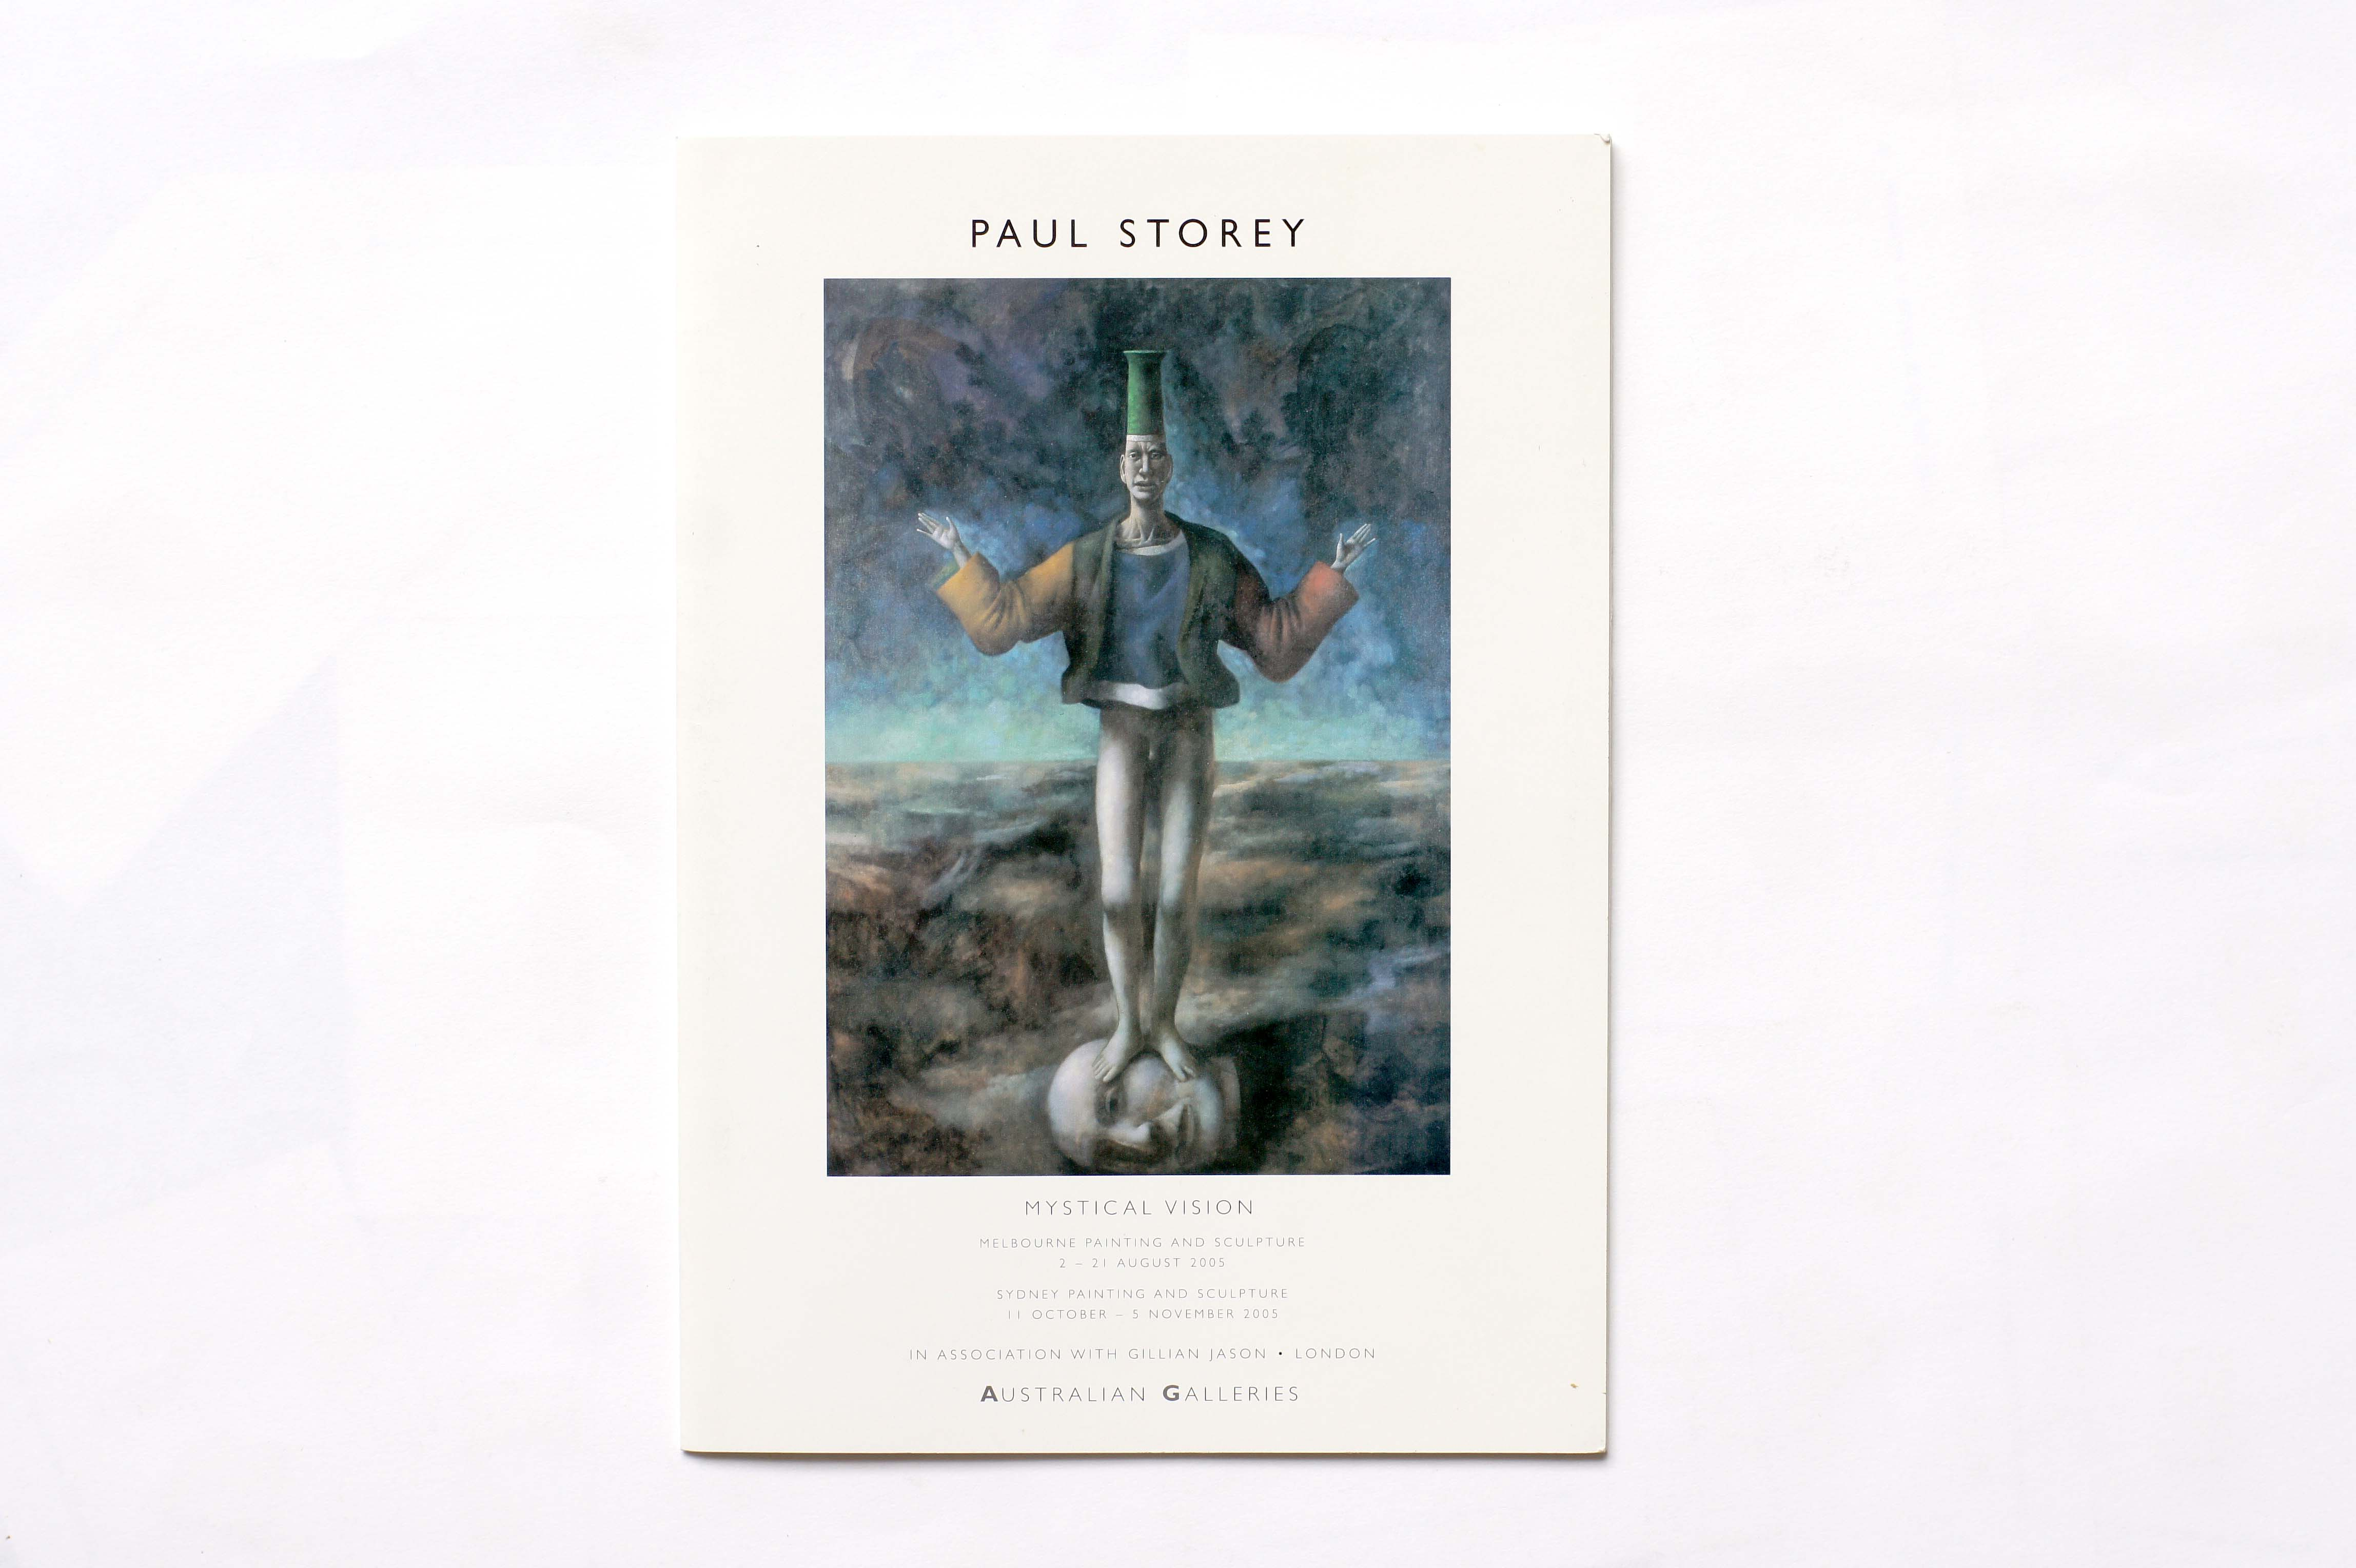 7 Australian Galleries Cover